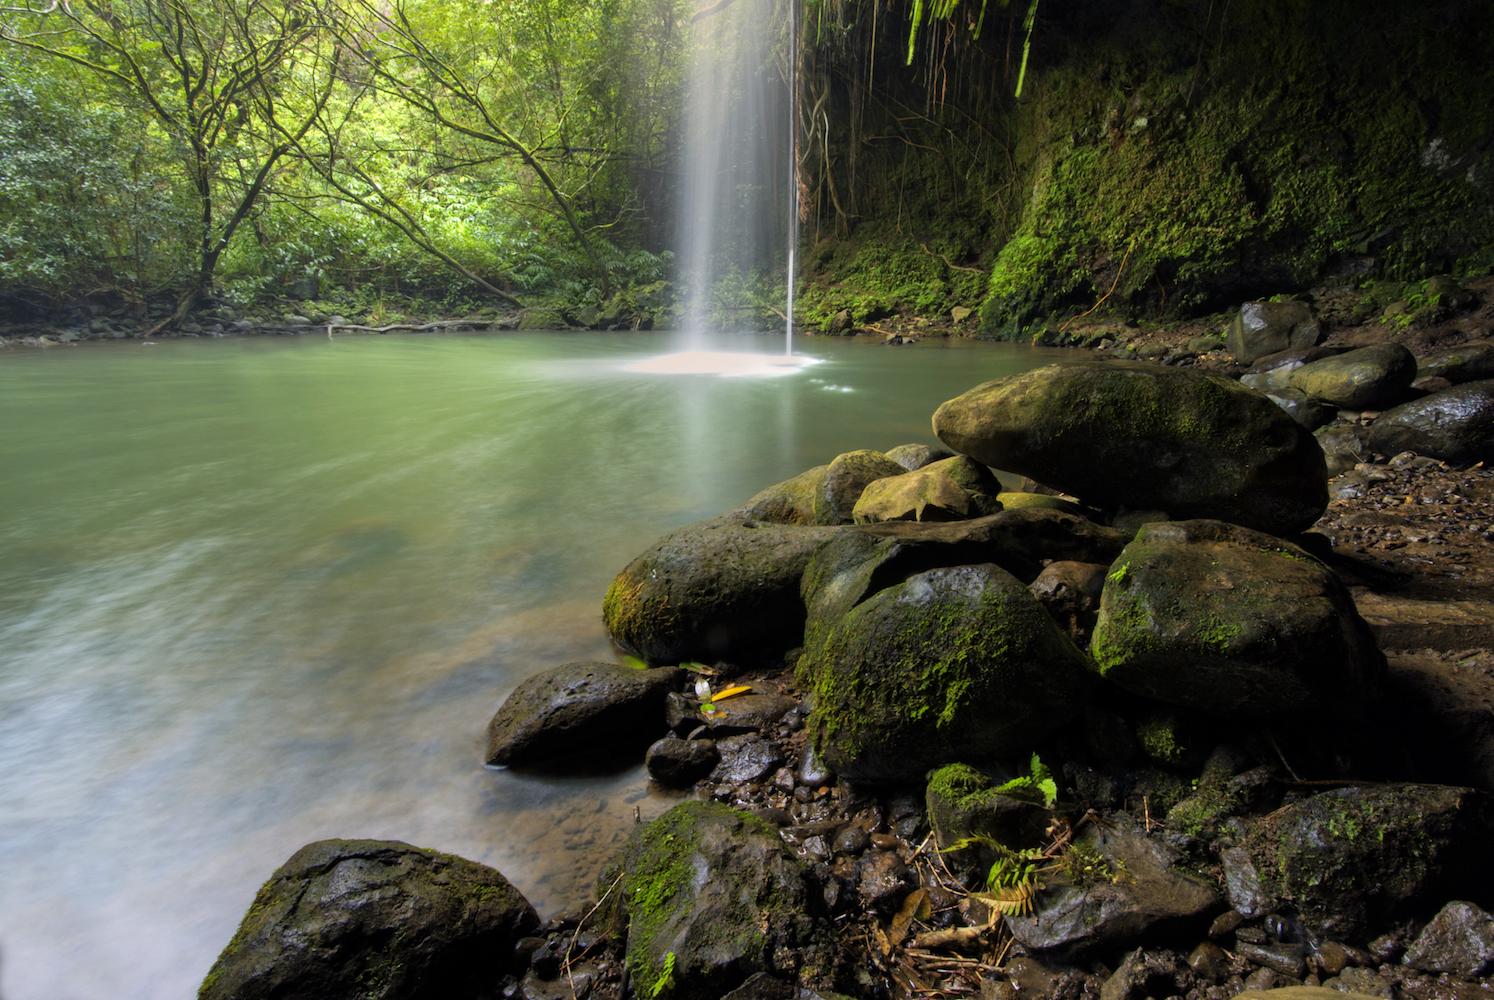 Blue_Soul_Maui_Private_Tour_Hana_Waterfall_20.jpg